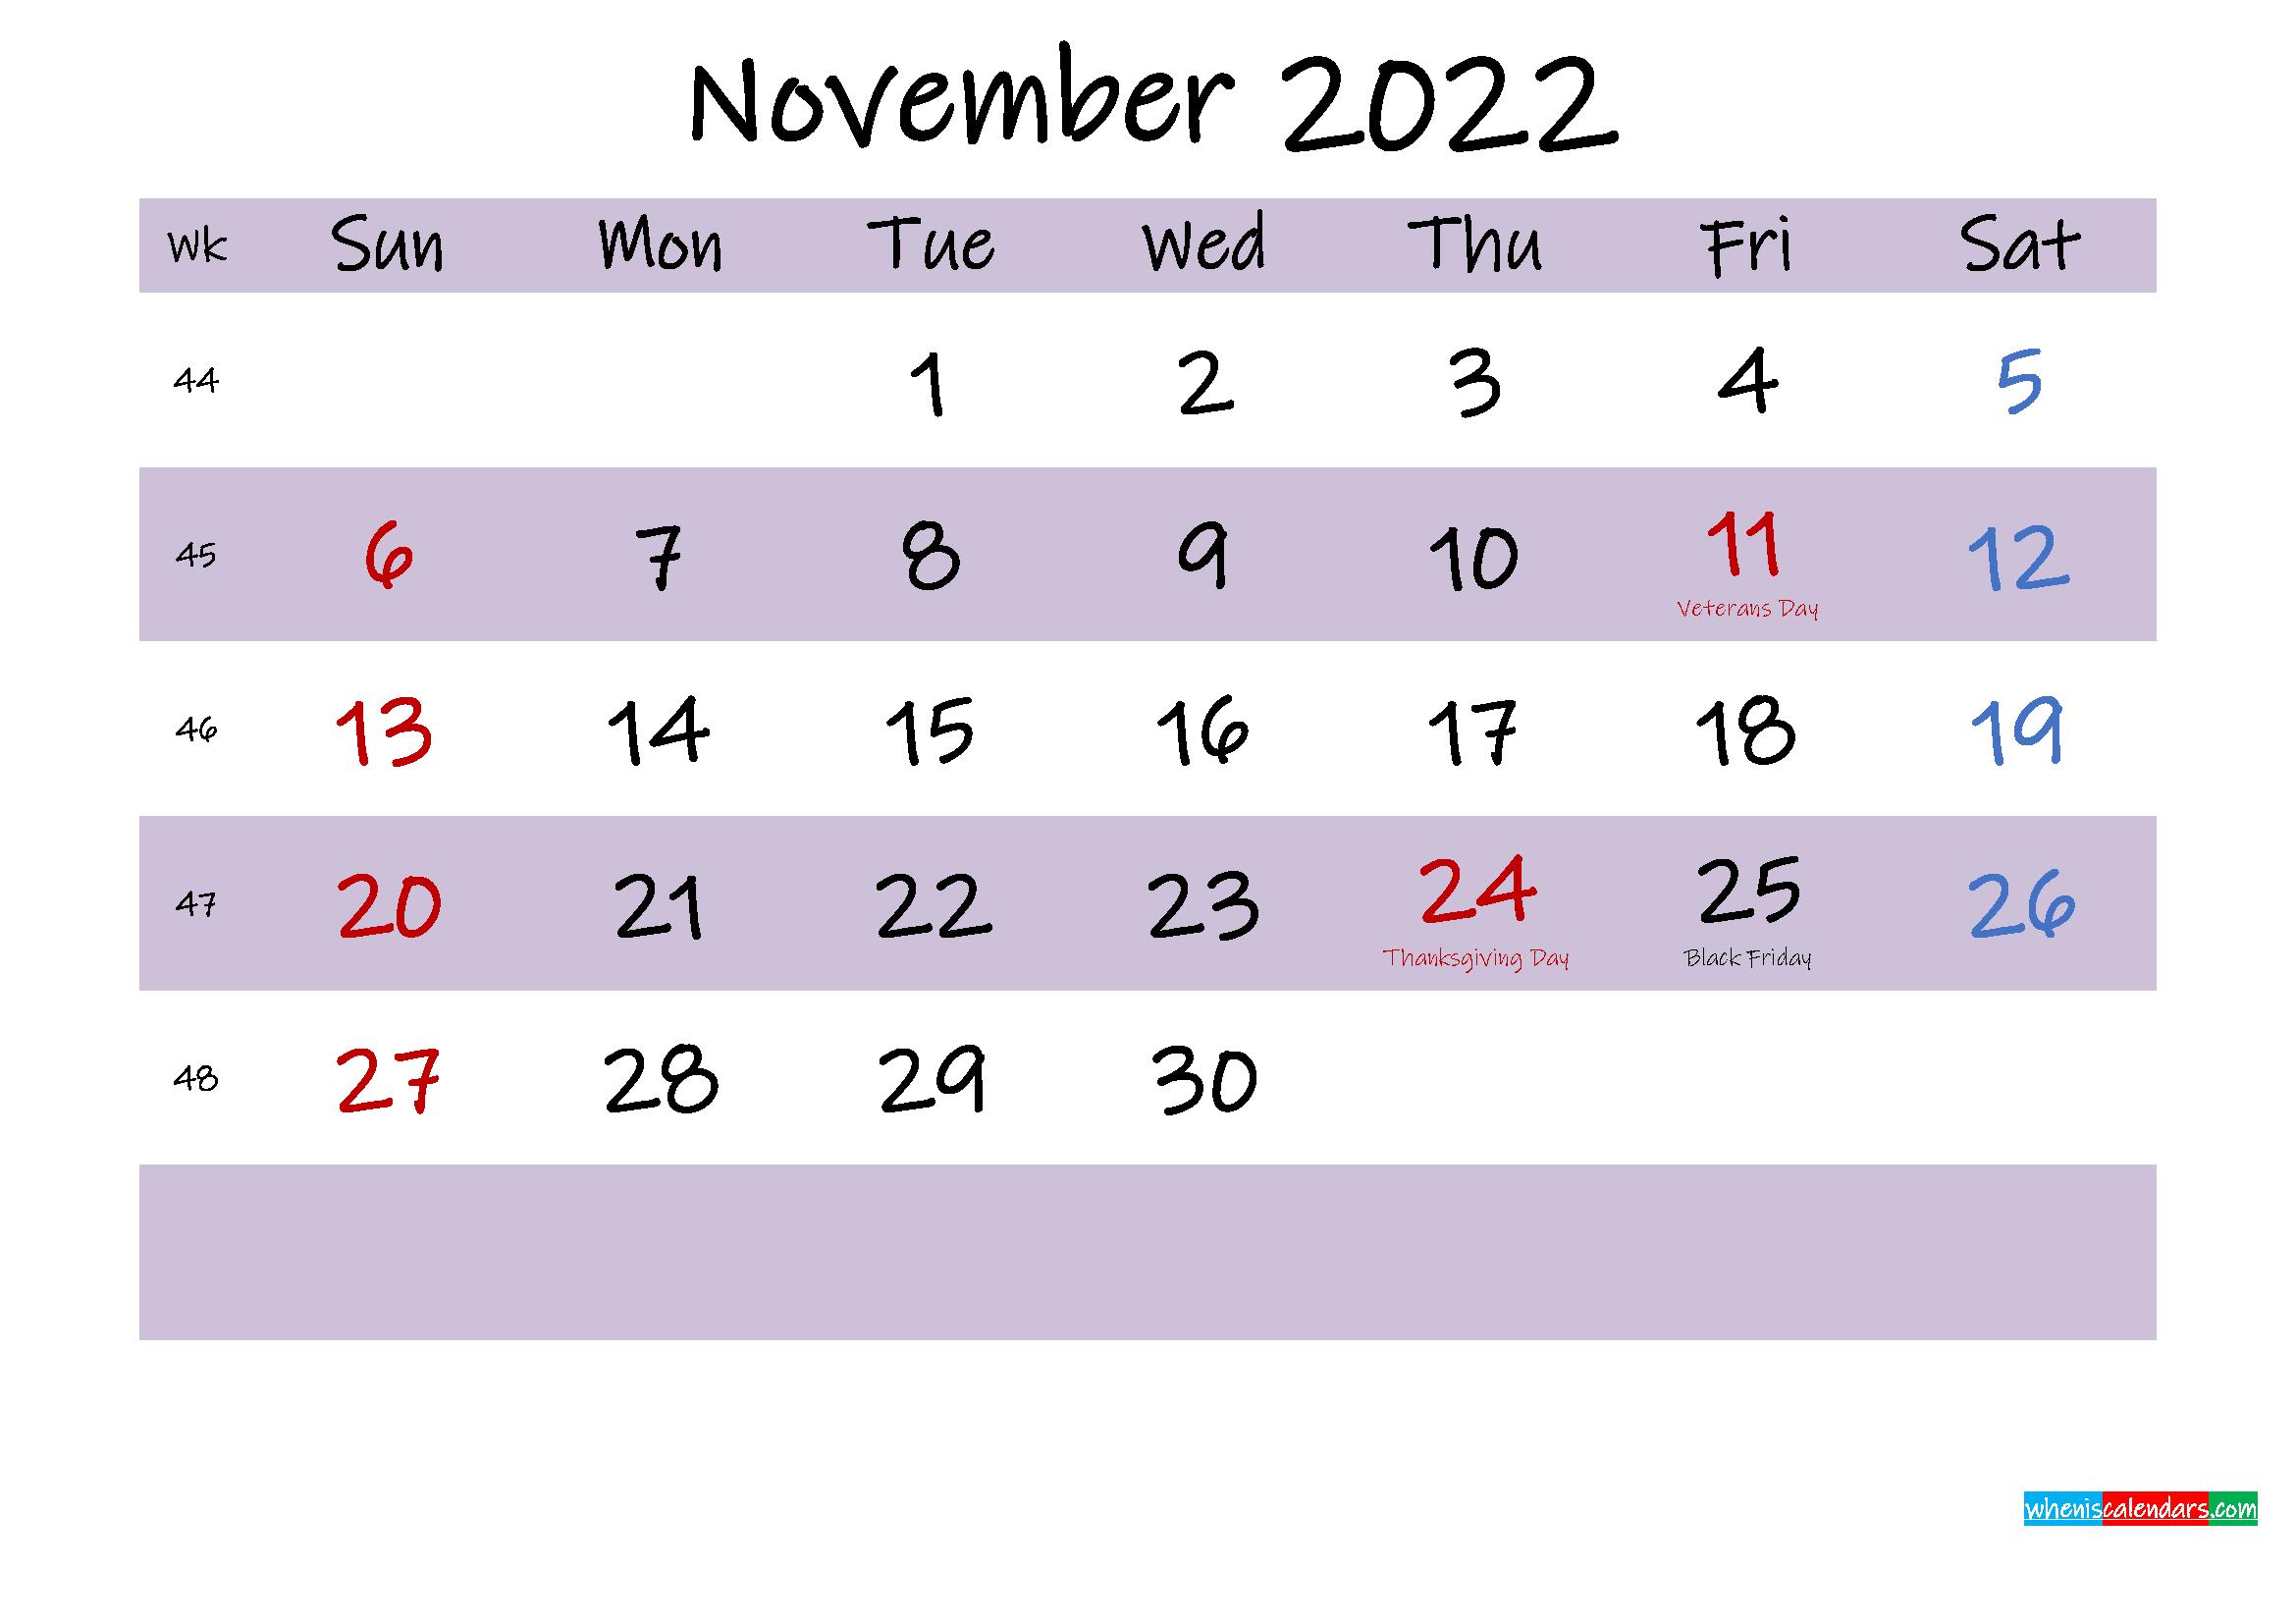 November 2022 Calendar with Holidays Printable